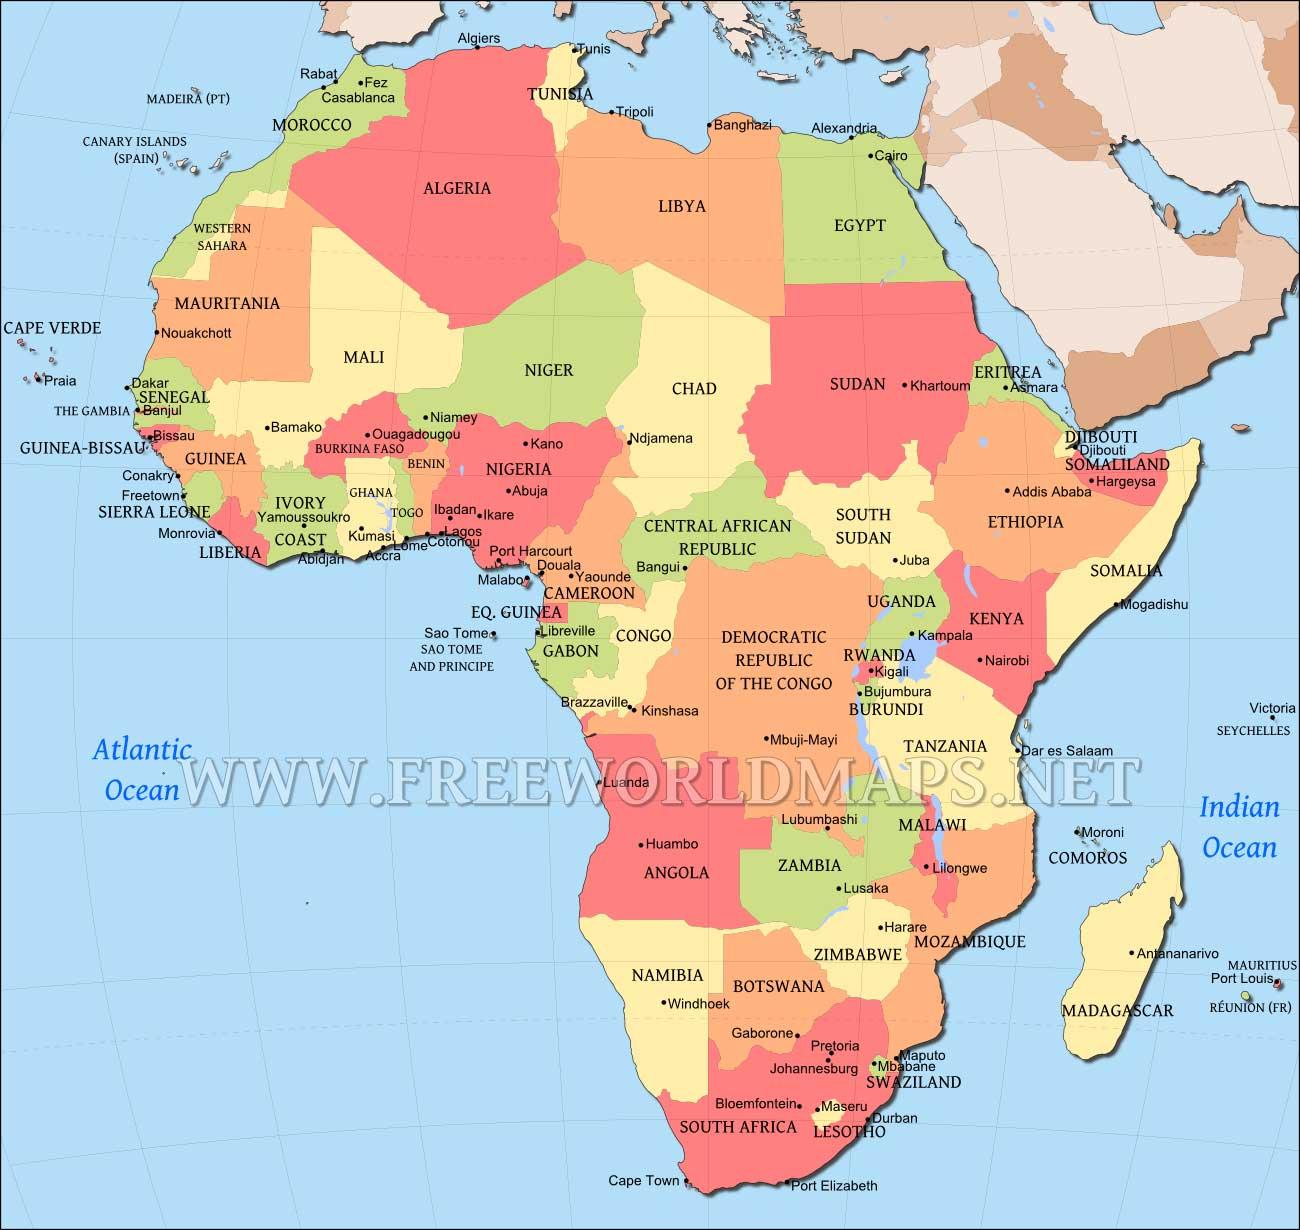 Africa Map Wallpaper - WallpaperSafari African Countries Map